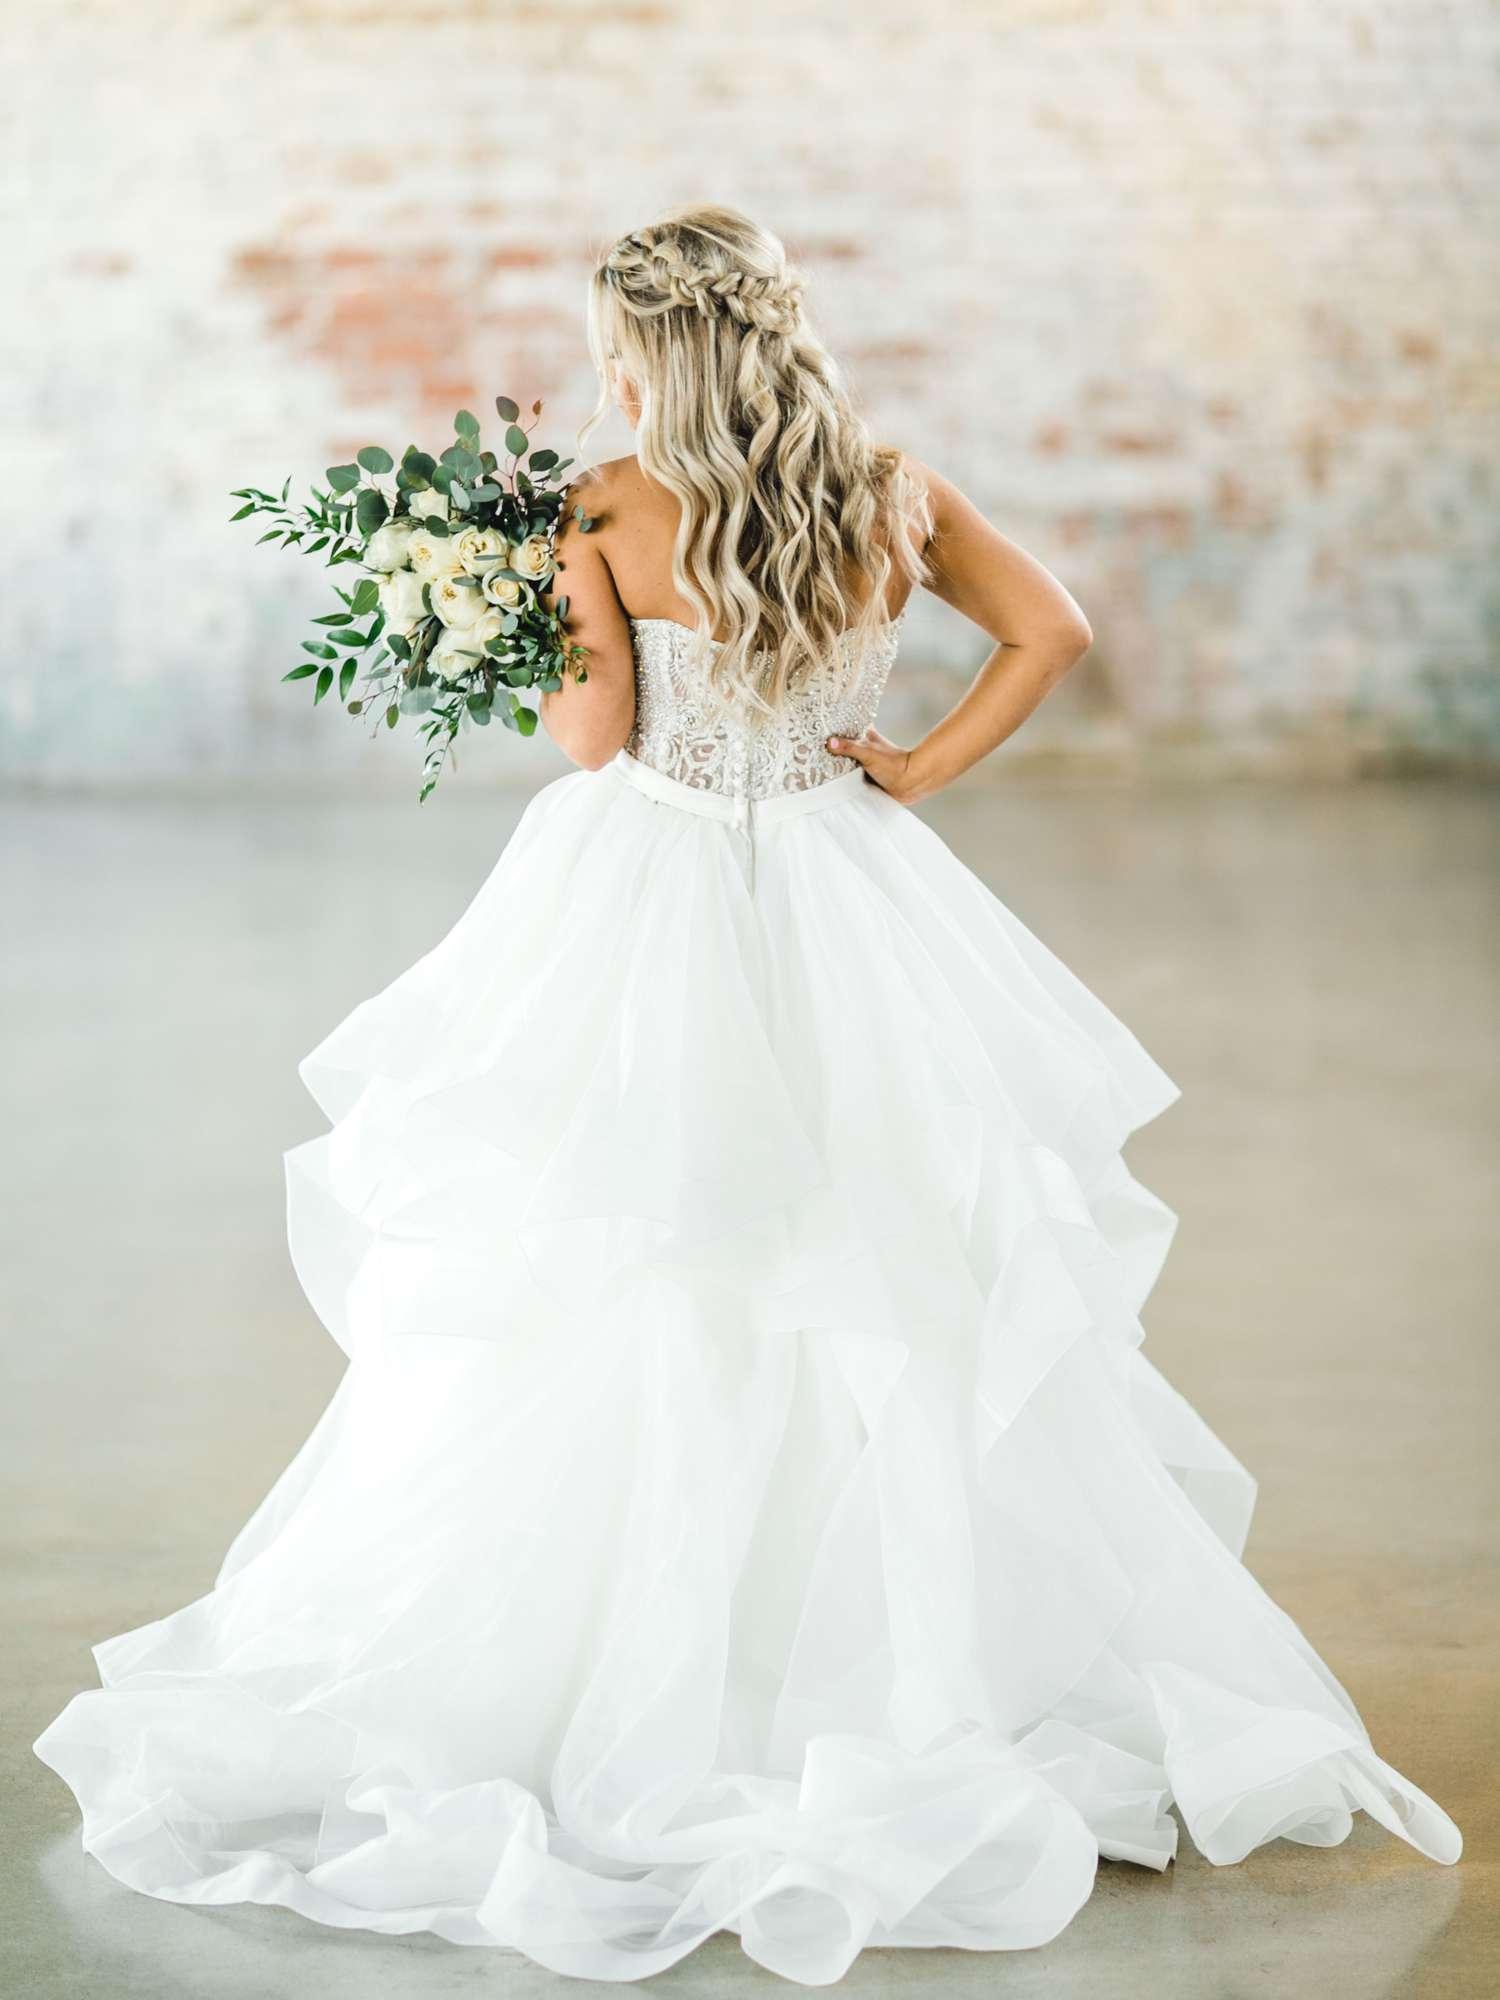 HAYLEE_DAVIS_ALLEEJ_LUBBOCK_WEDDING_PHOTOGRAPHER_BRIDALS_0014.jpg